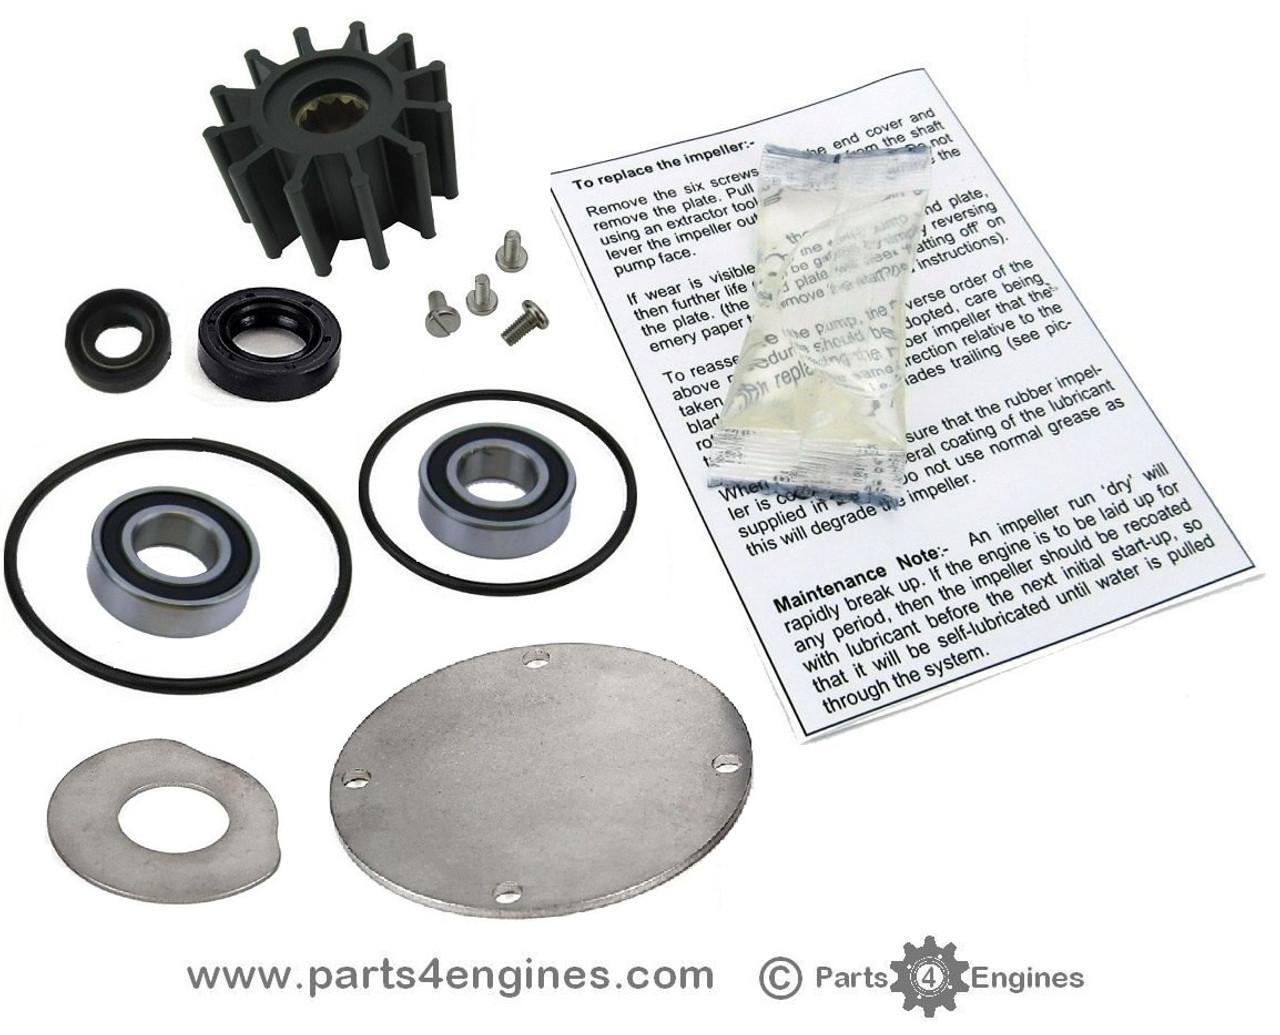 Volvo Penta D2-60 Raw water pump rebuild kit - parts4engines.com